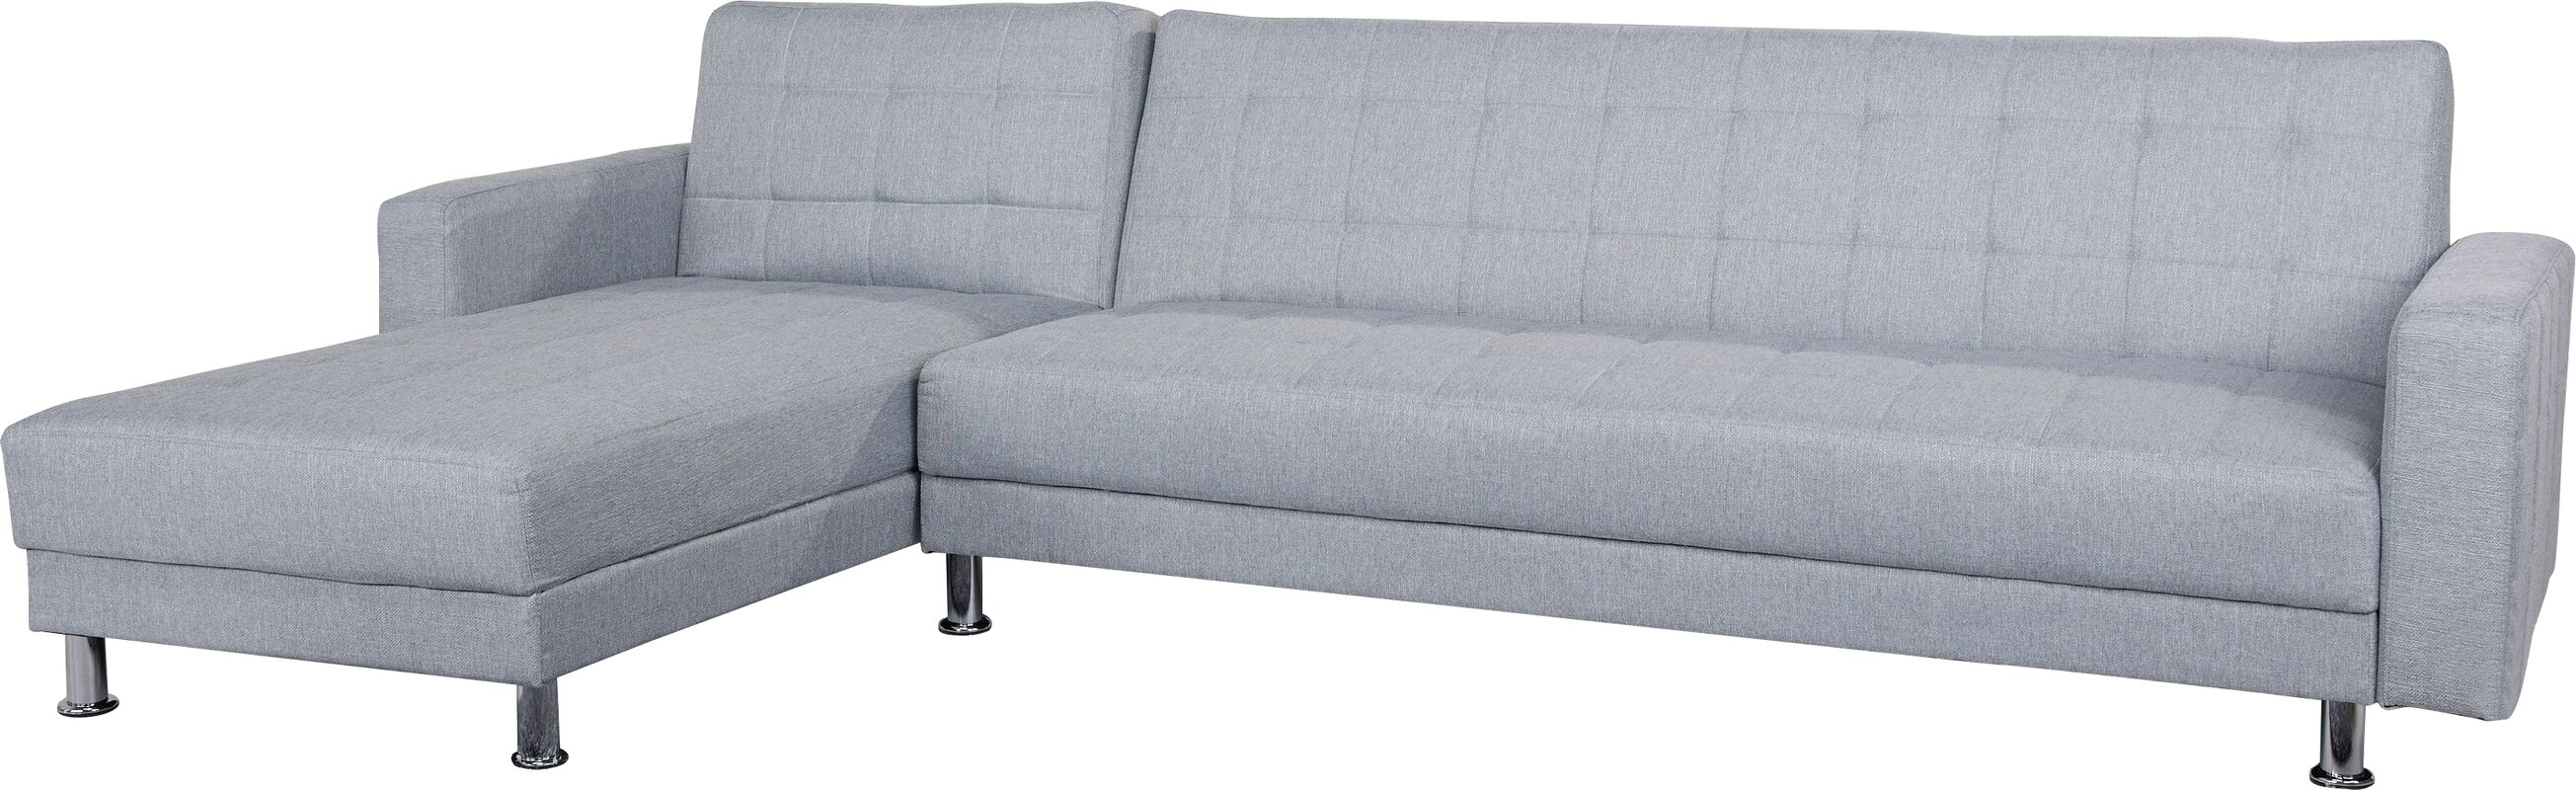 Shirley Corner Sofa Bed